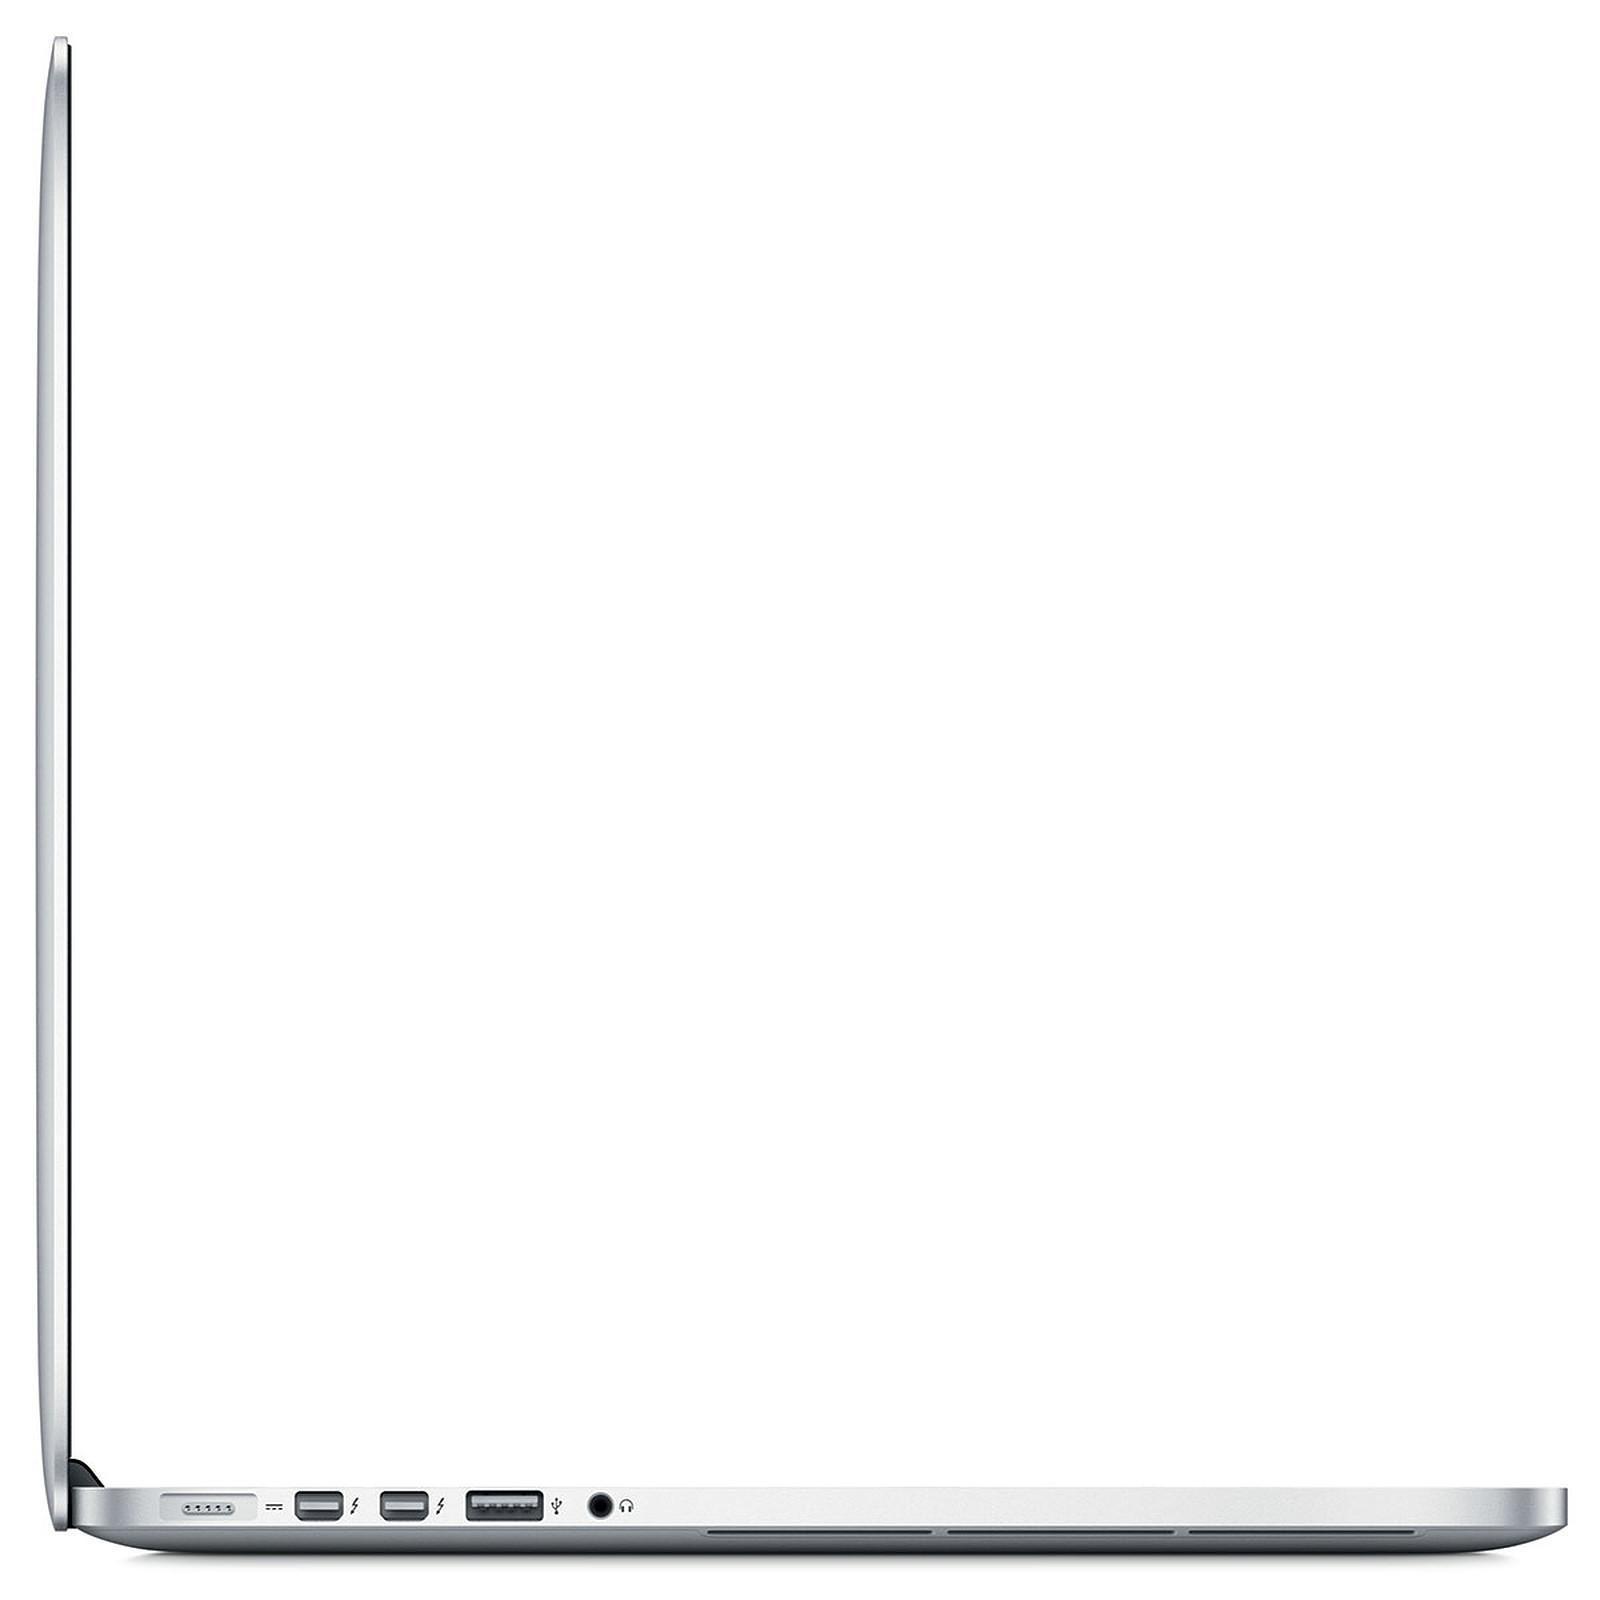 MacBook Pro Retina 15,4-tum (2014) - Core i7 - 16GB - SSD 256 GB QWERTY - Nederländska